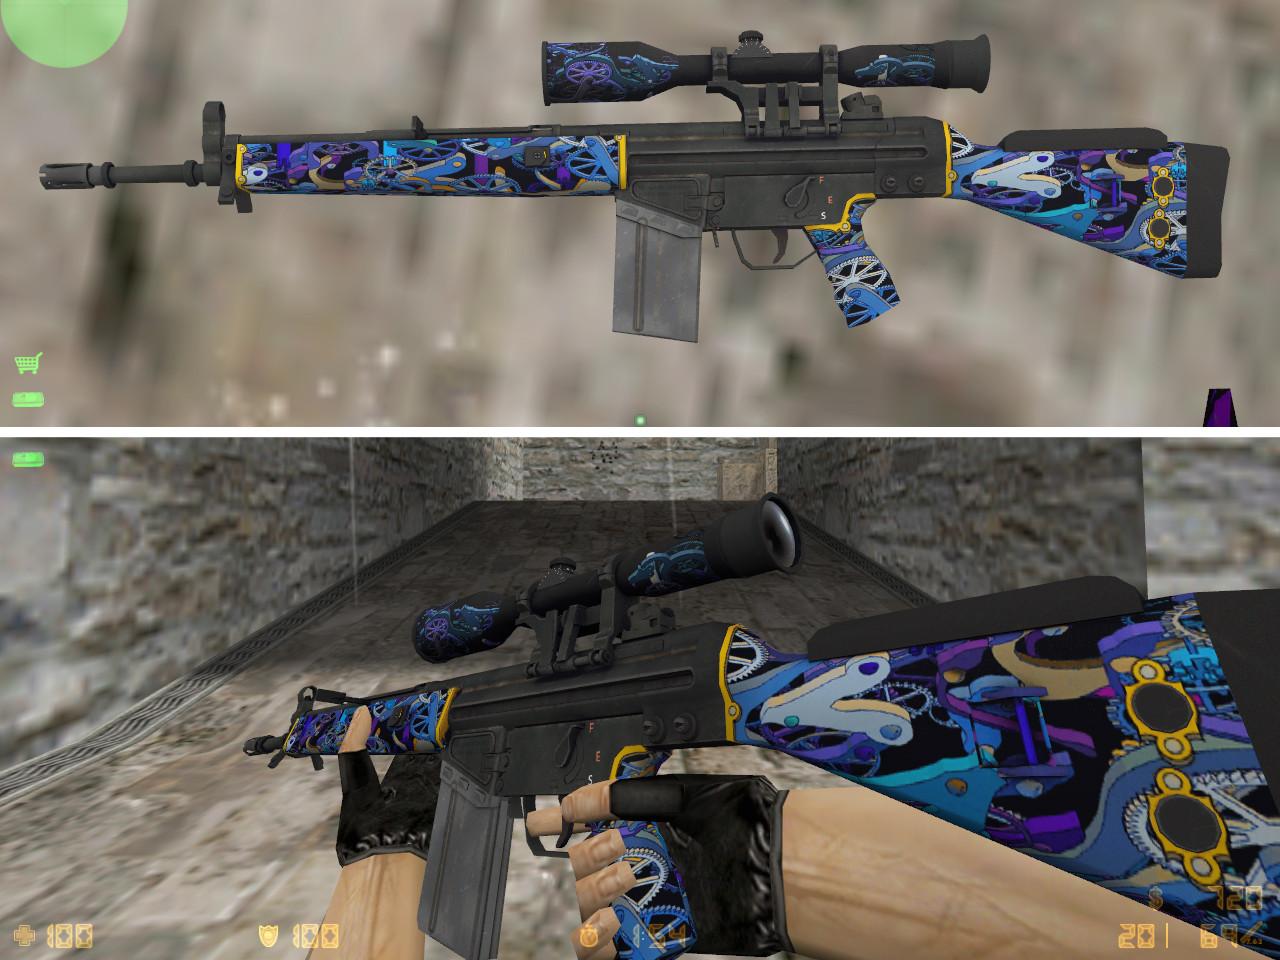 counter strike 1.6 g3sg1 skins